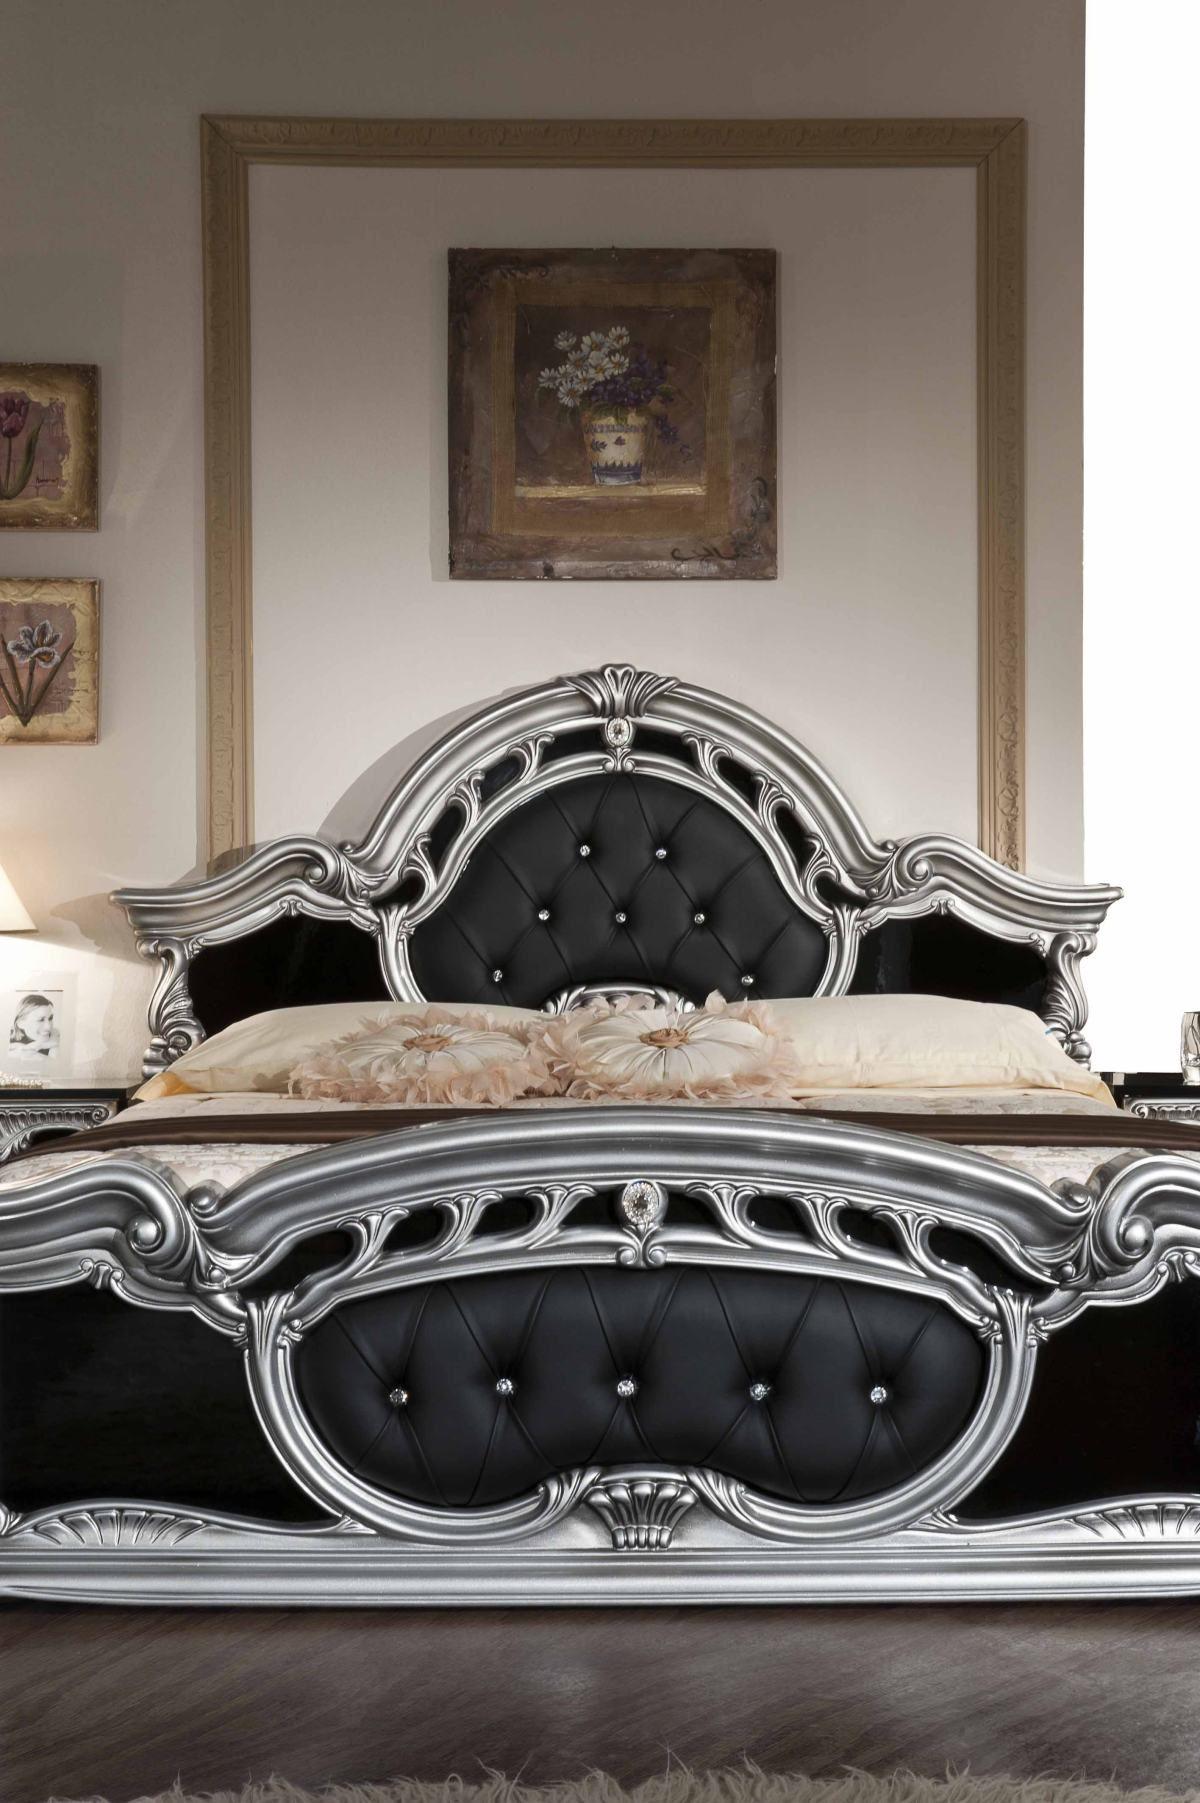 Hotel Furniture Type Style Italian Bedroom Set Royal Luxury Bedroom Furniture Luxury Bedroom Furniture Wooden Bed Design